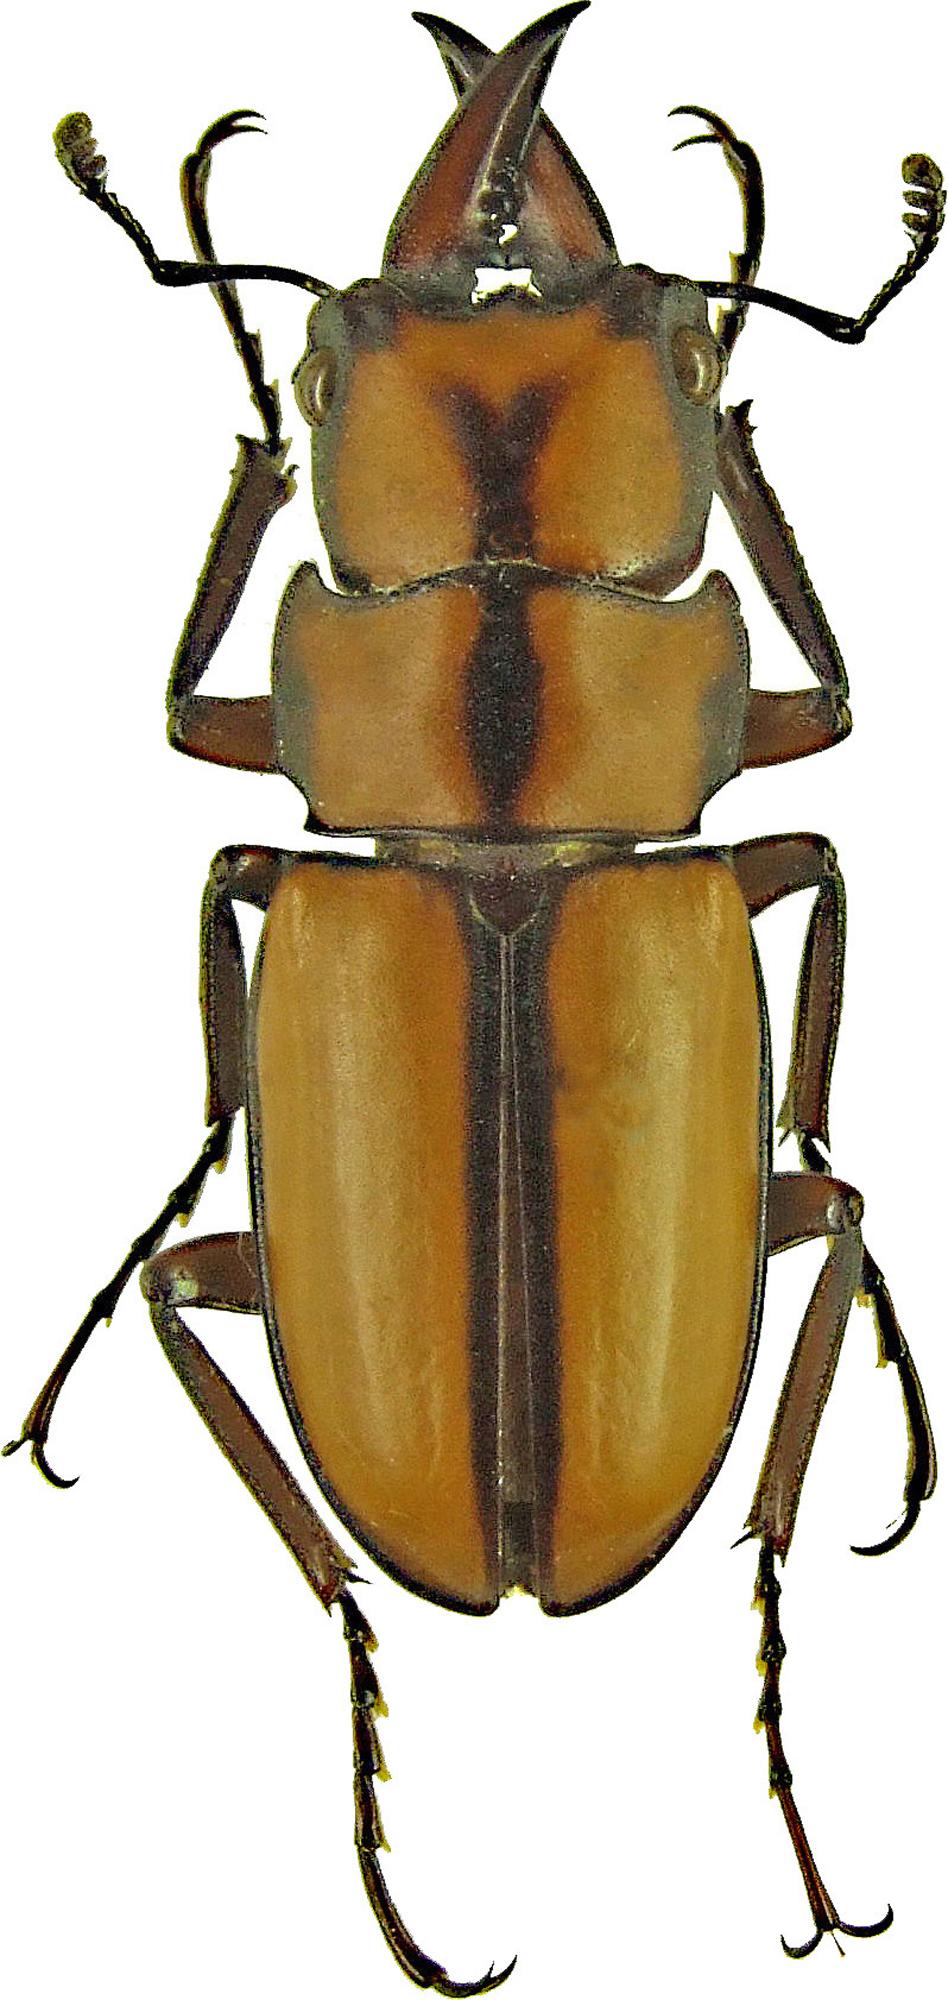 Prosopocoilus (Metopodontus) kannegieteri 1199.jpg